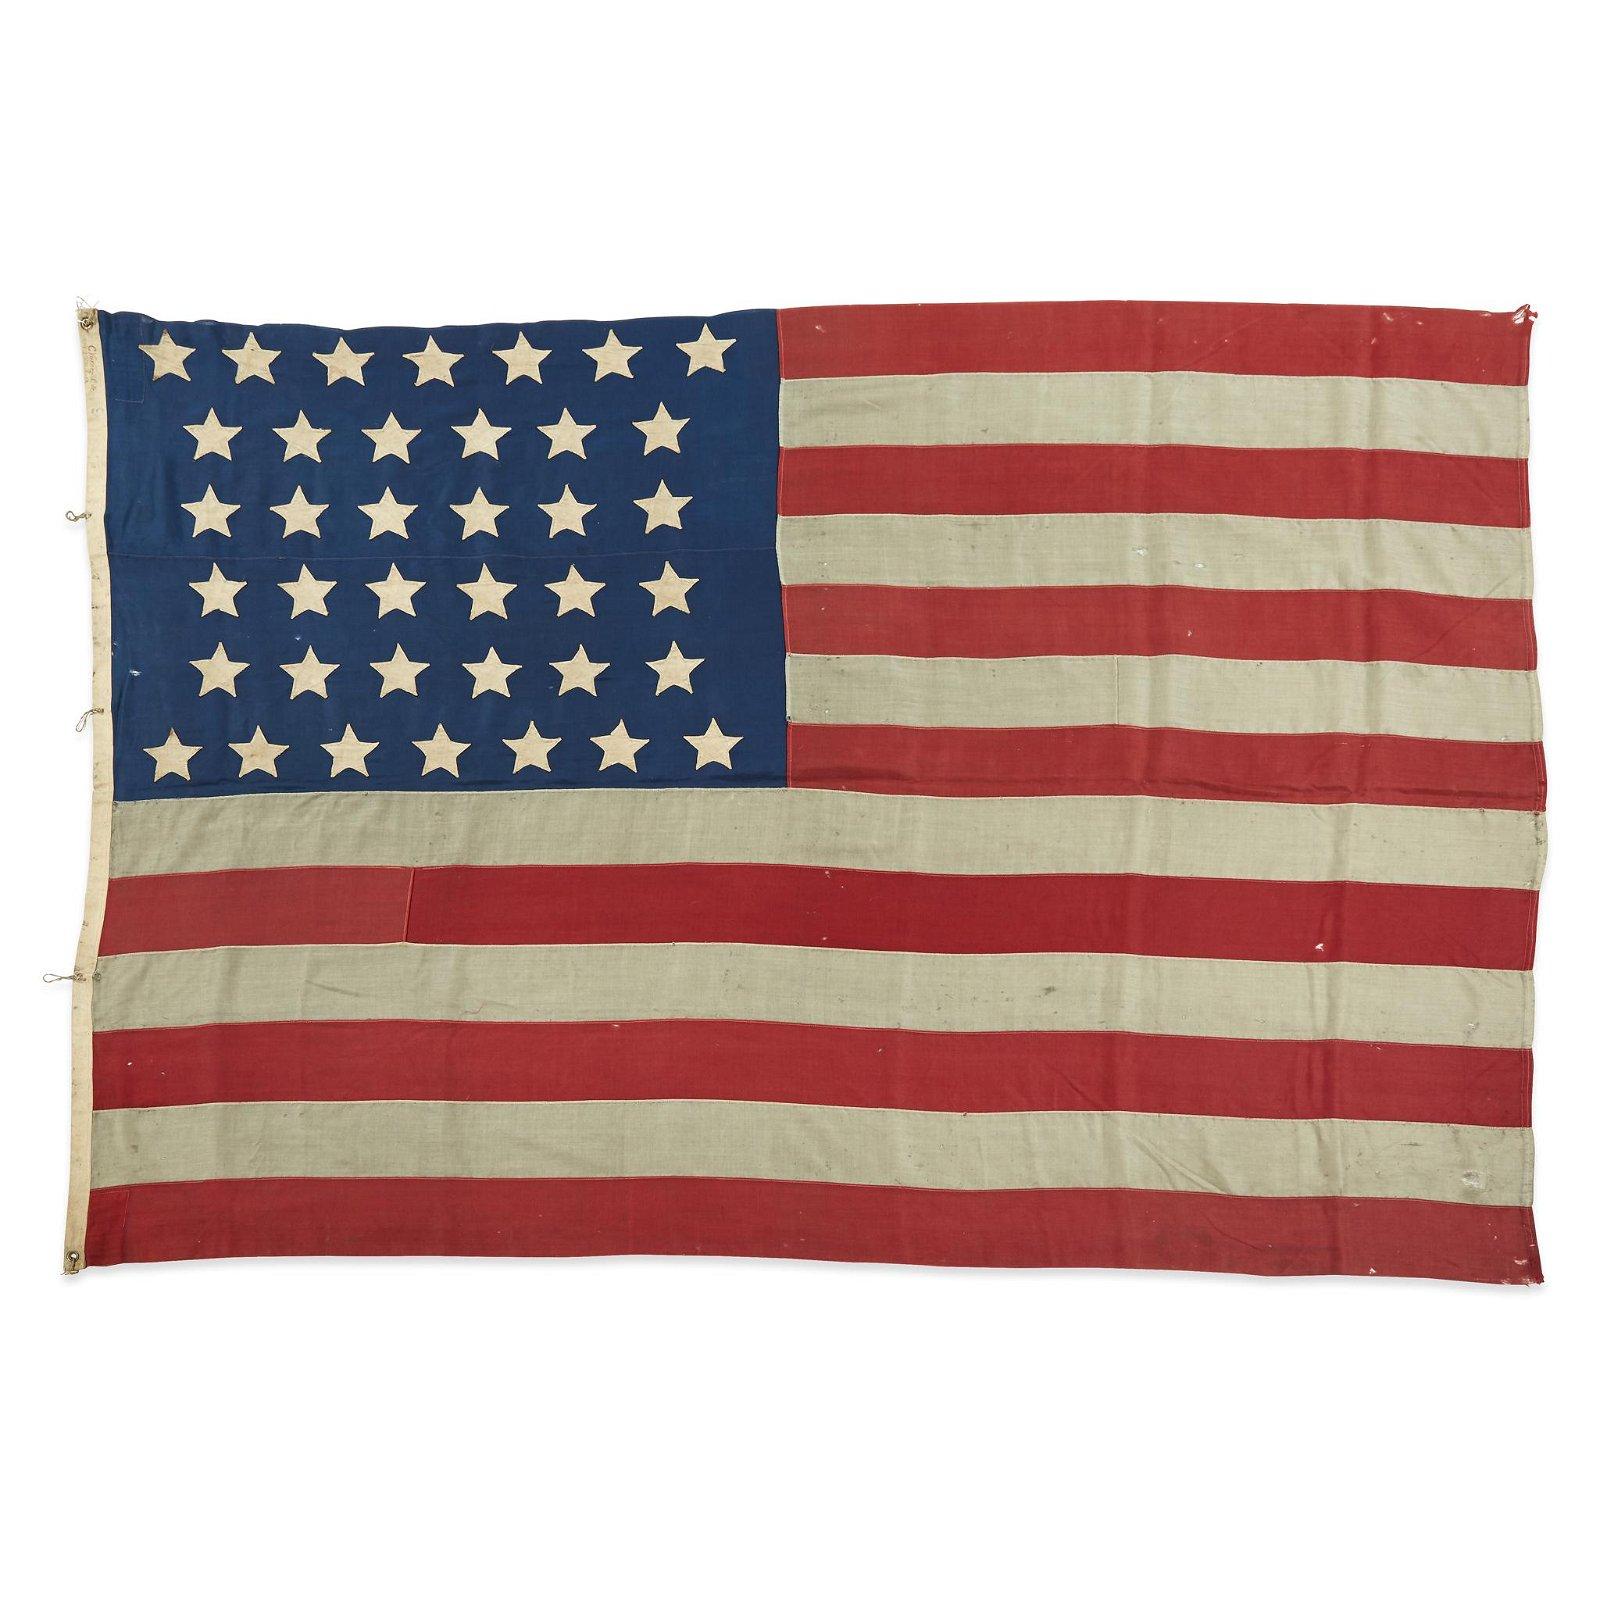 A 38-Star American Flag commemorating Colorado